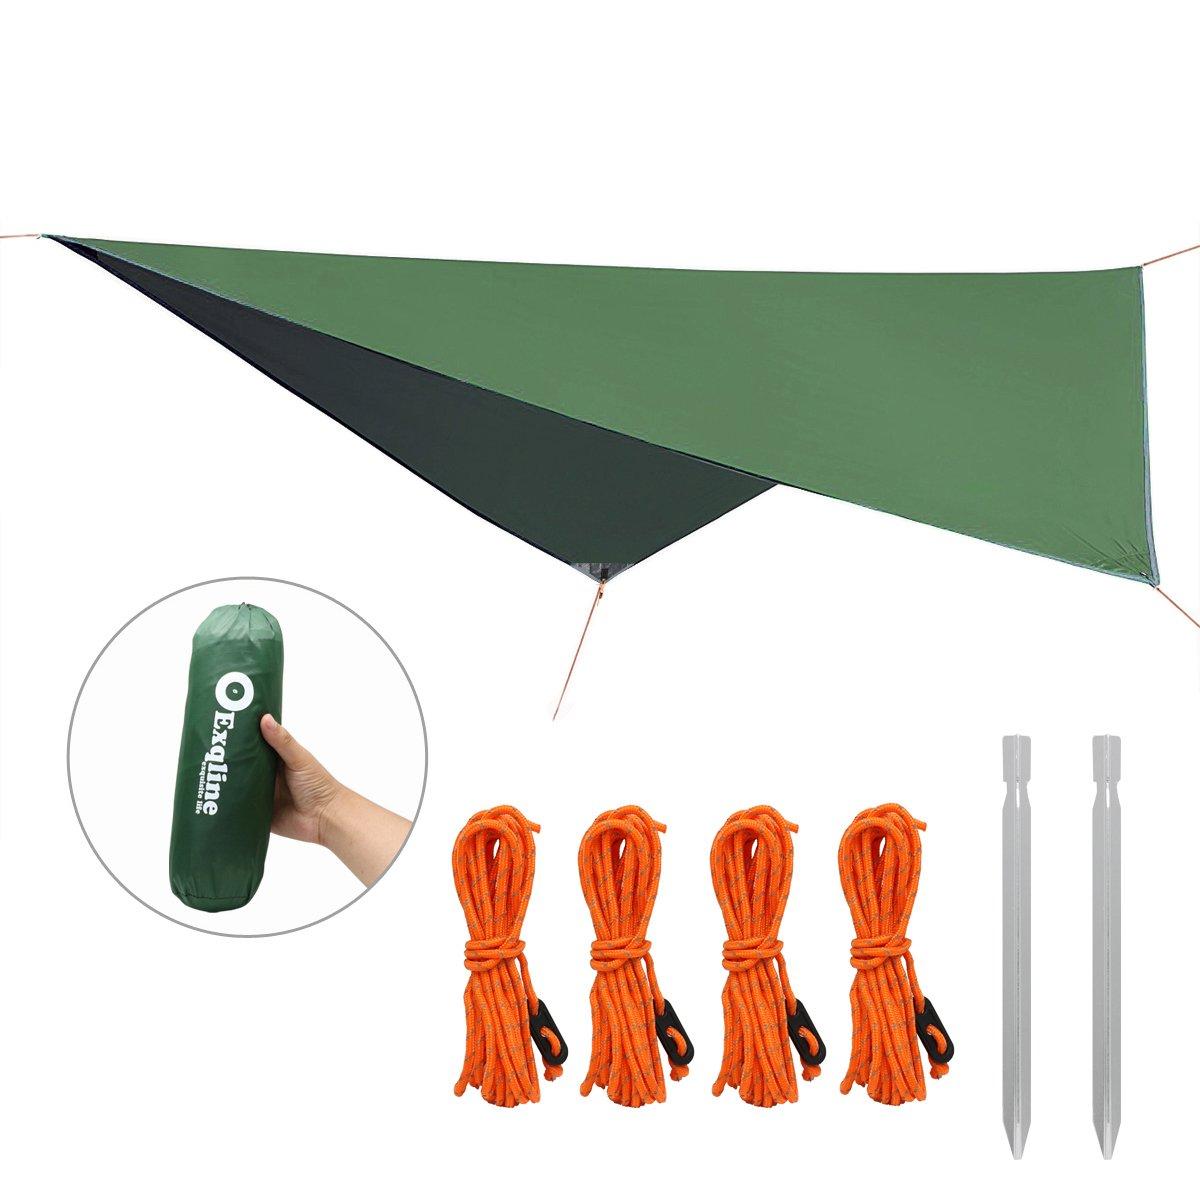 Exqline Hammock Rain Fly, Waterproof Ultralight Tent Tarp Sunshade Rain Tarp Shelter for Hiking Camping Backpacking